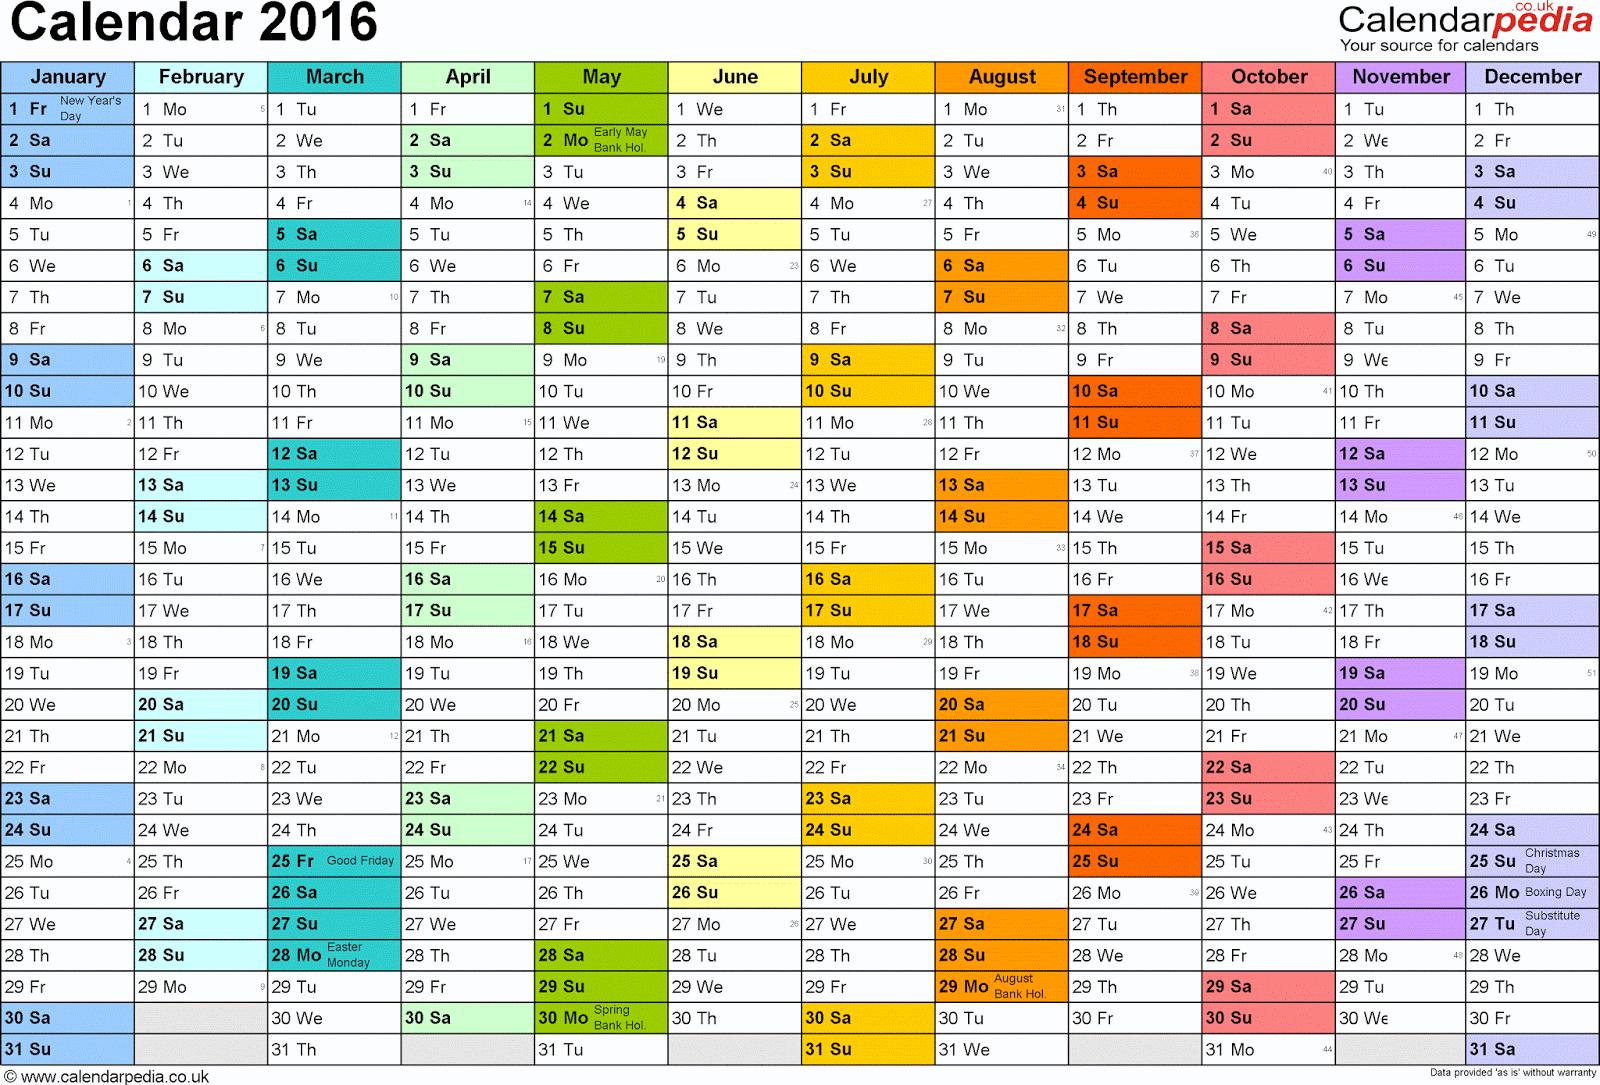 printable calendar 2016 with holidays 2016 calendar with holidays 2016 ...